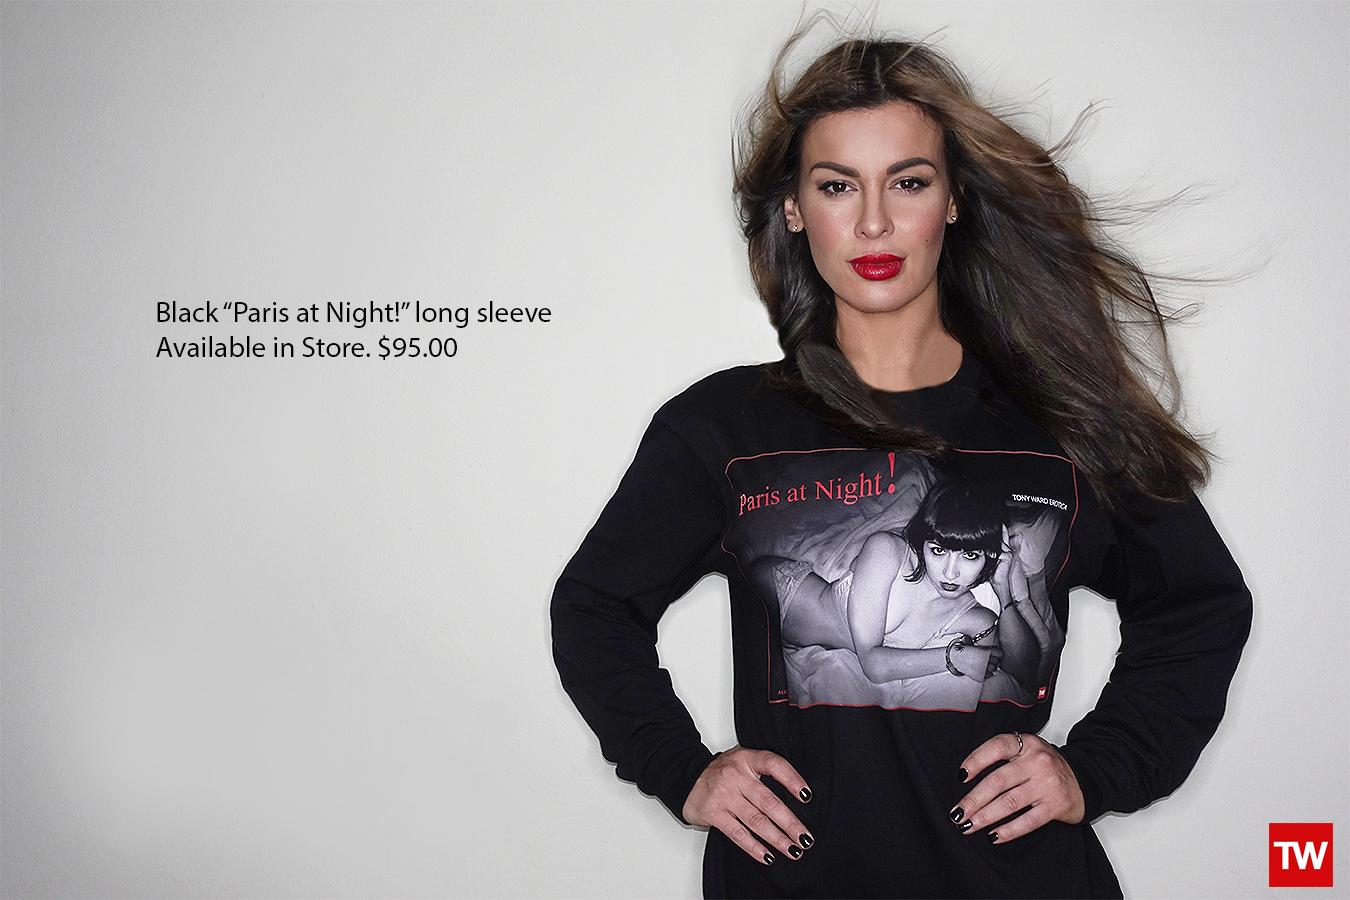 Tony_Ward_Studio_e-commerce_store_t-shirts_I_wear_erotica_pricepsd